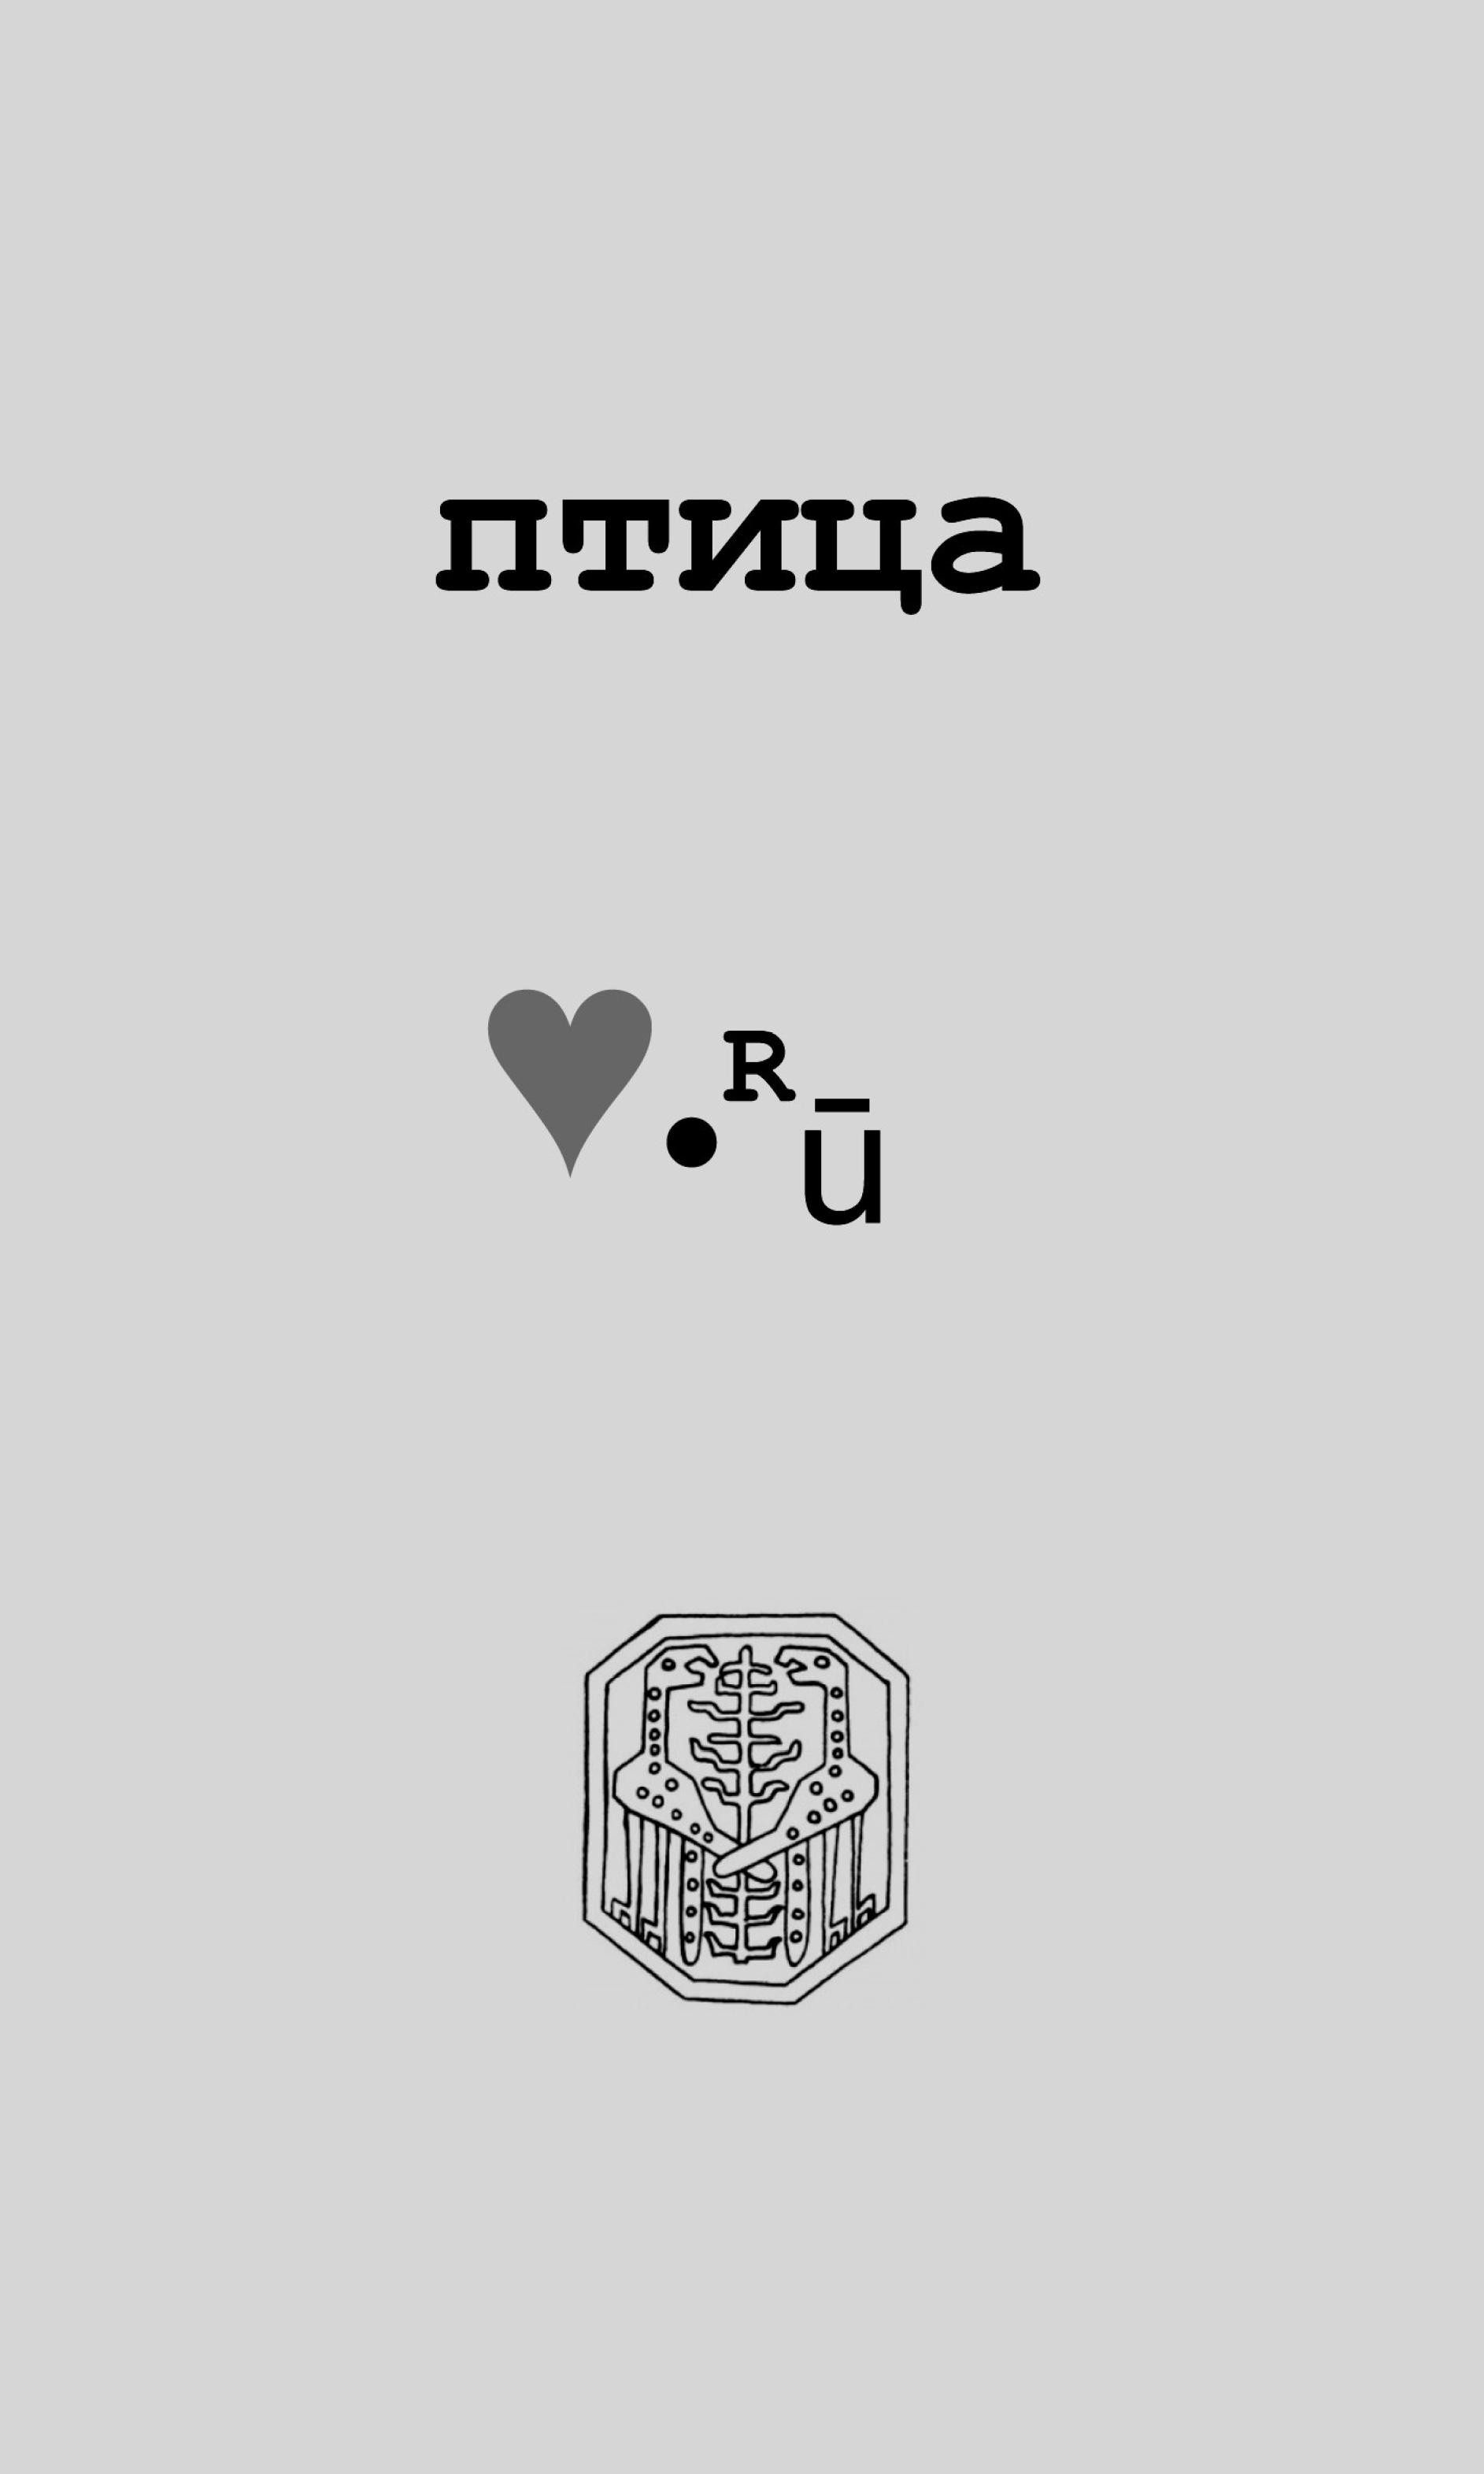 Георгий Ефремов Птица Love.Ру баженов георгий похищение любви